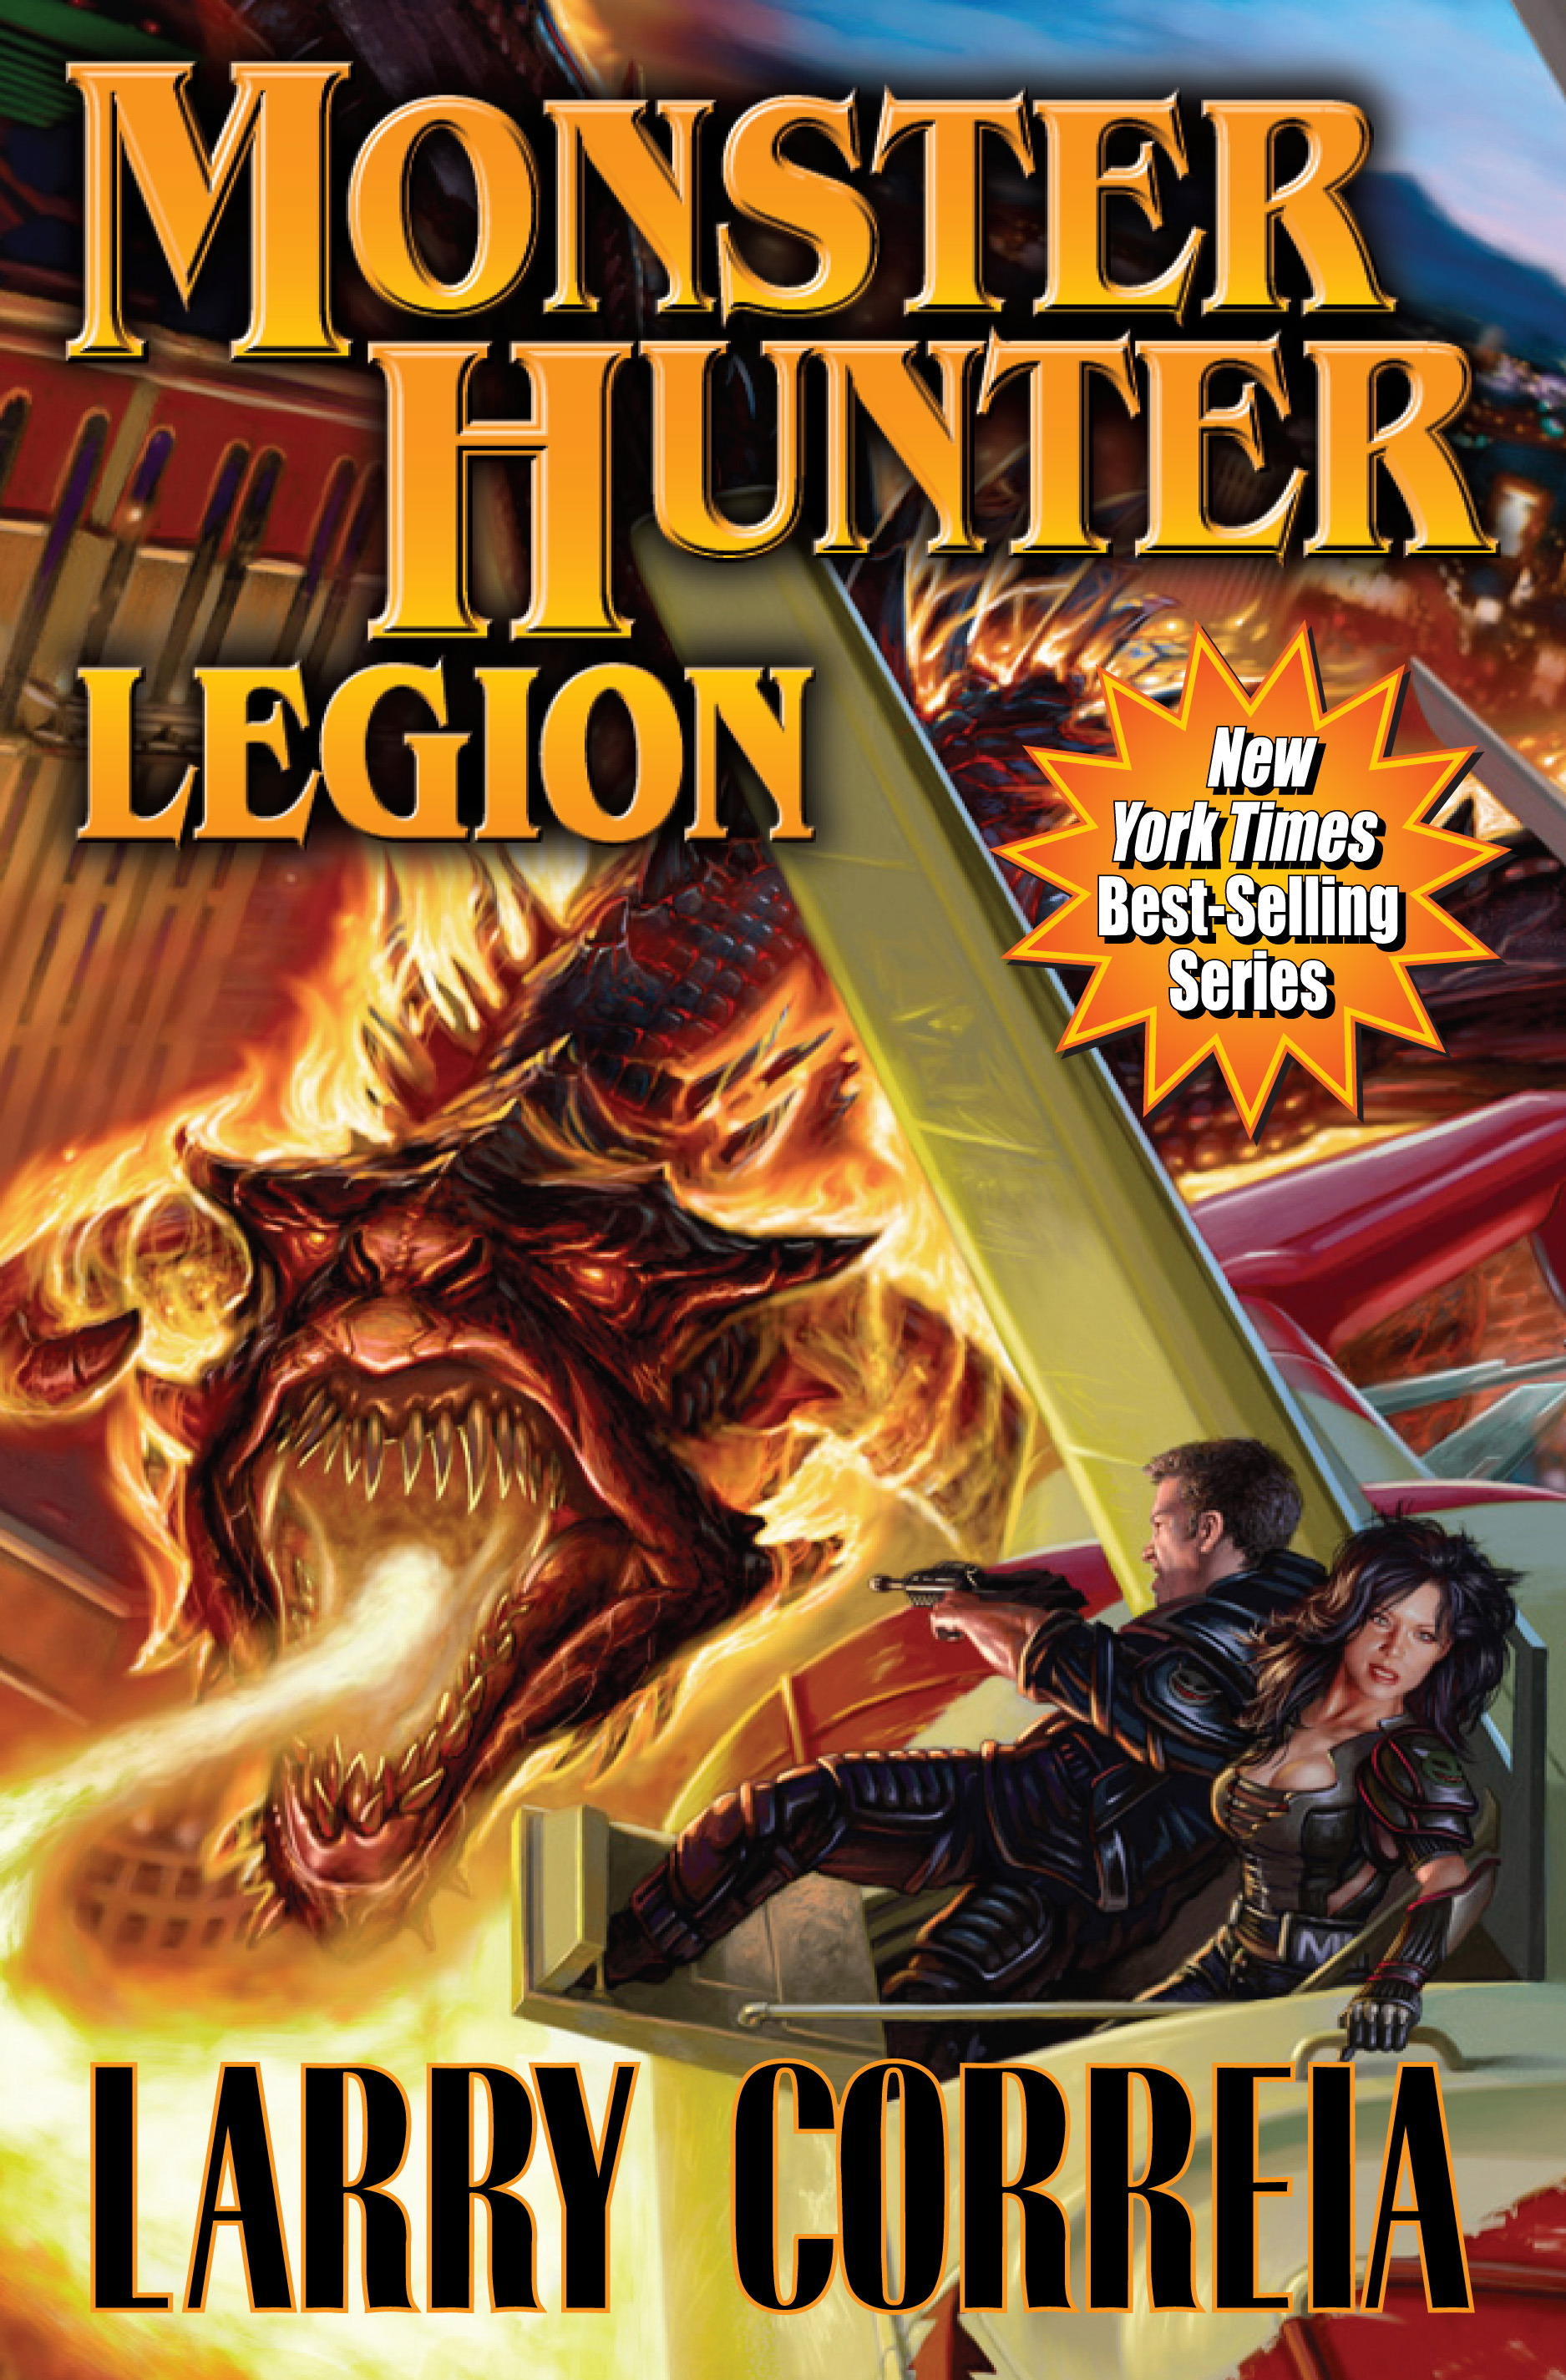 monster hunter legion larry correia wiki fandom